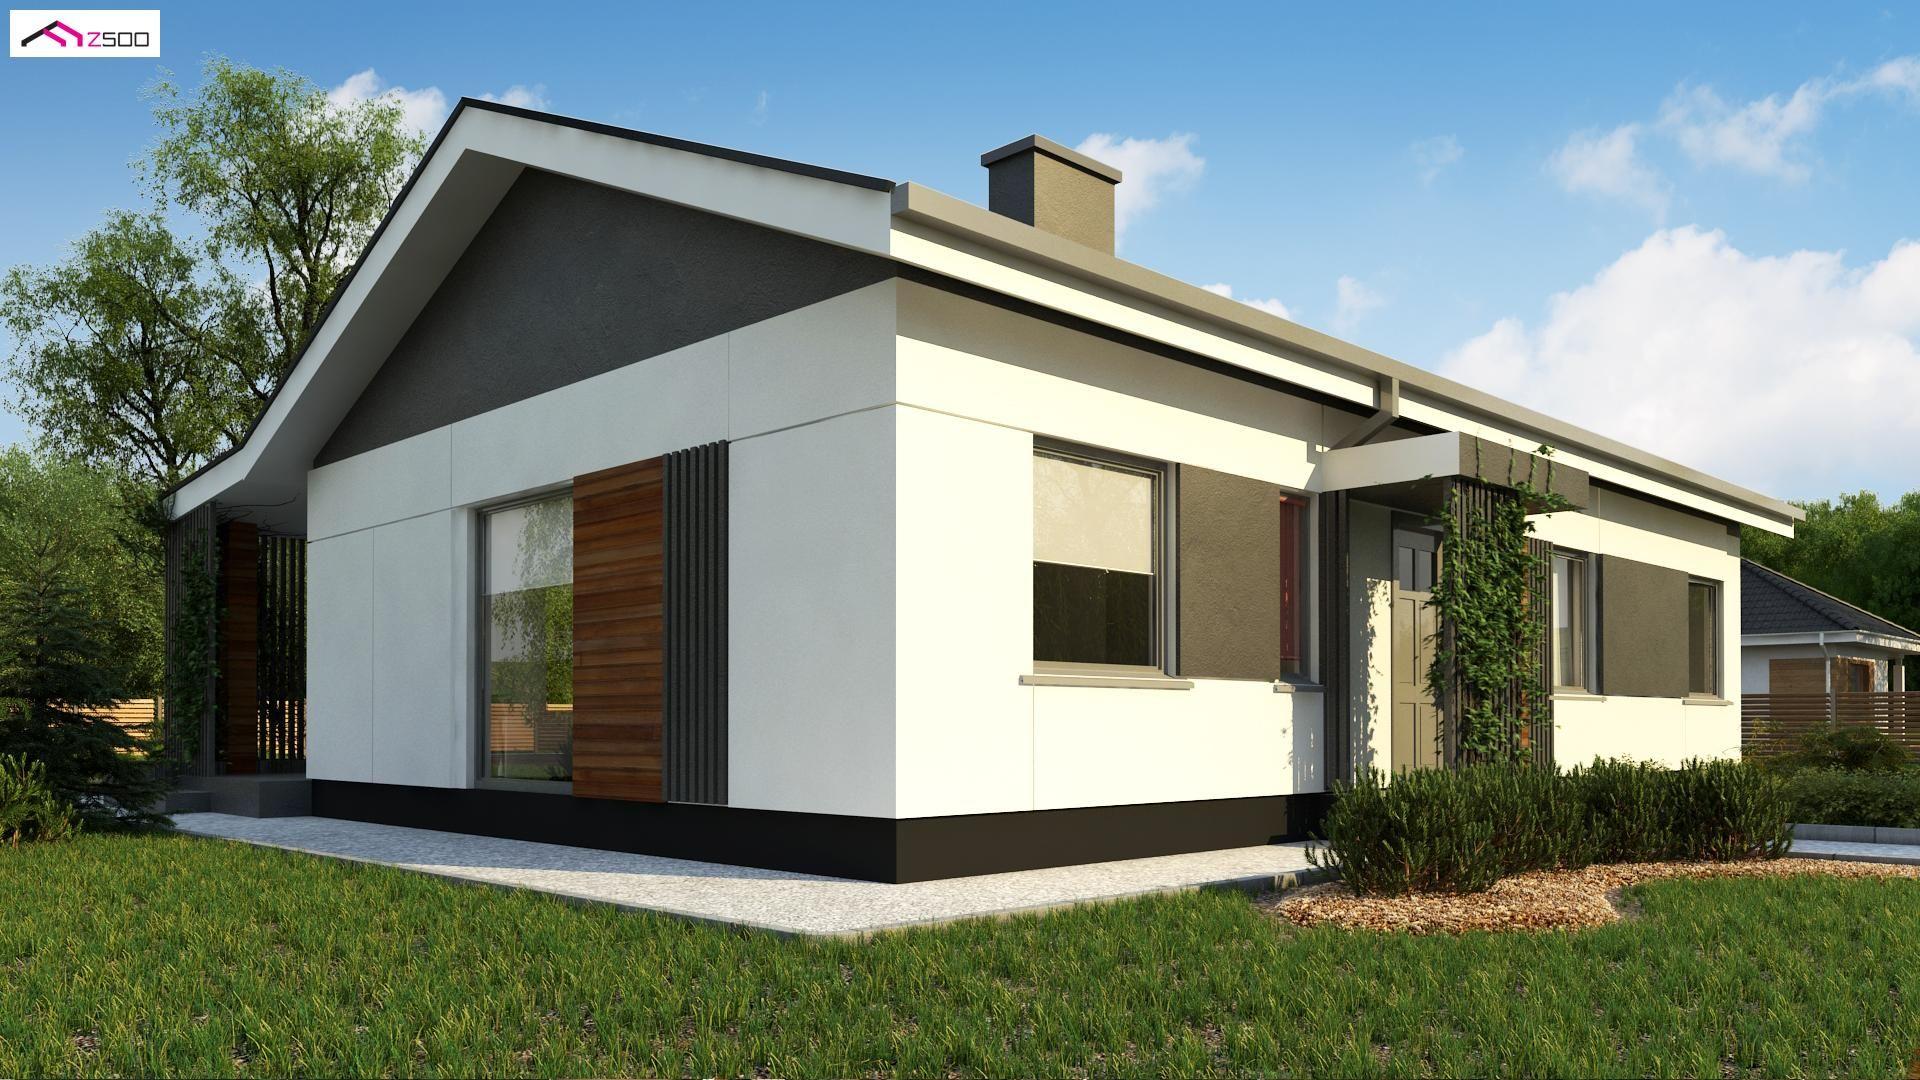 Techwood House Z500 Casas Prefabricadas Casas